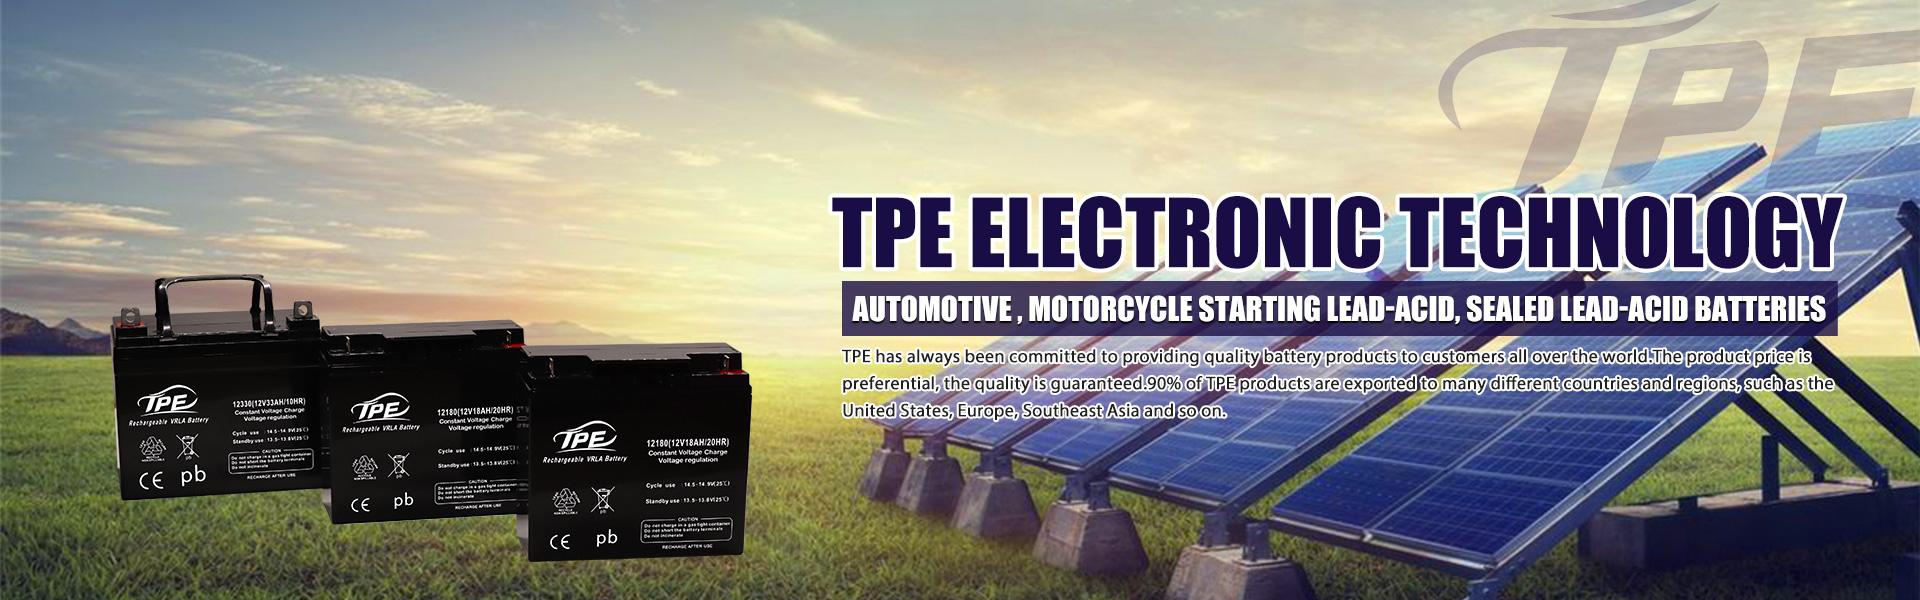 Automotive--motorcycle-starting-lead-acid-sealed-lead-acid-batteries-Banner-01